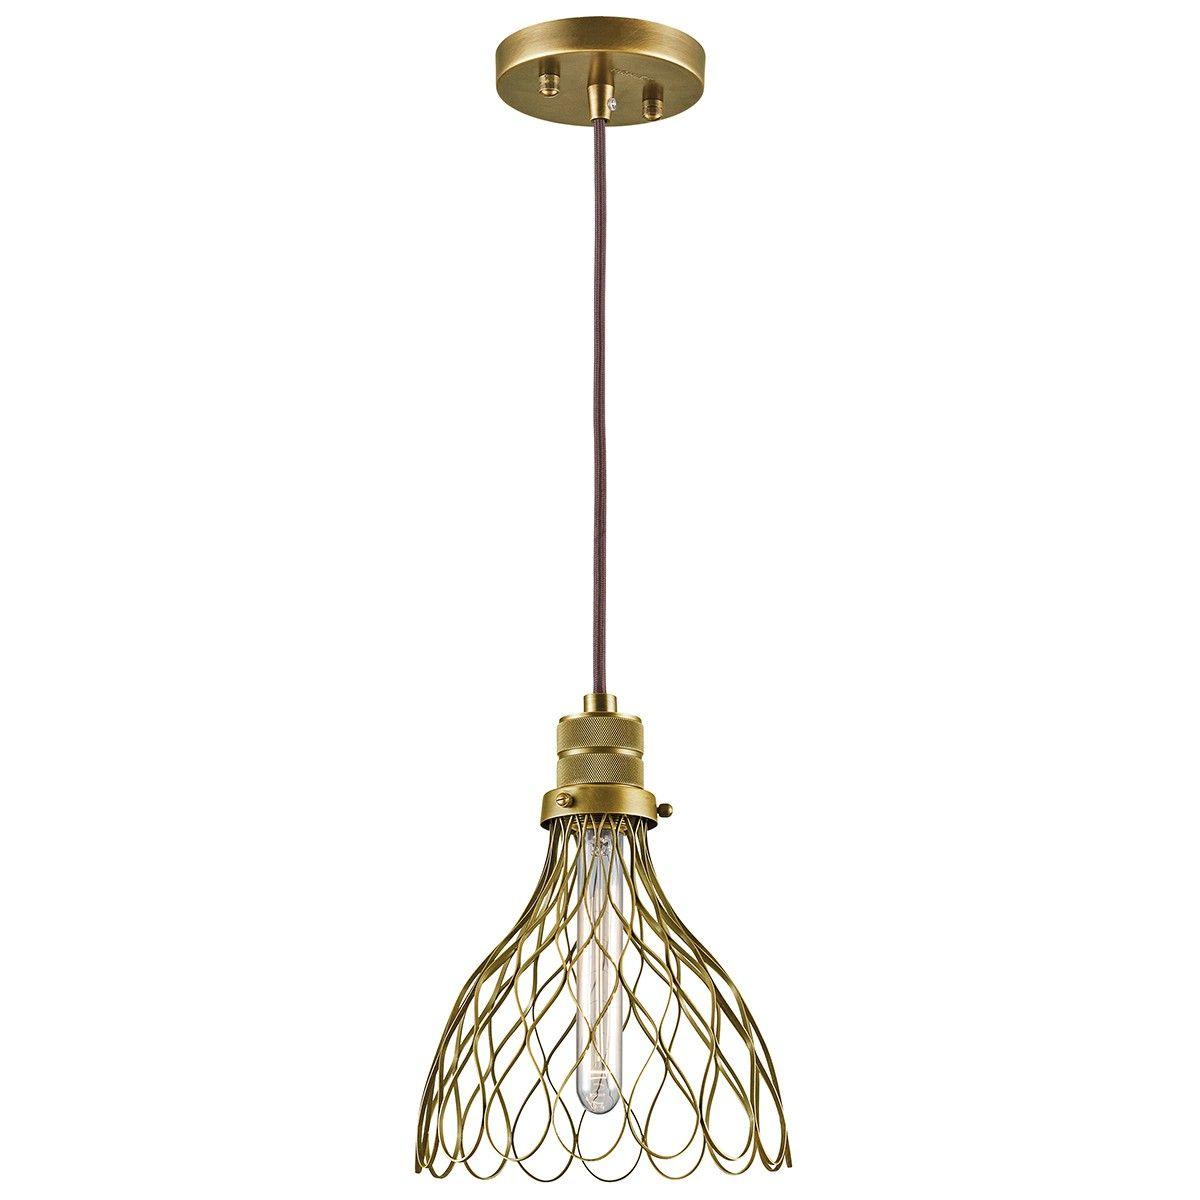 Kichler Devin Mini Pendant In Natural Brass Mini Pendant Lights